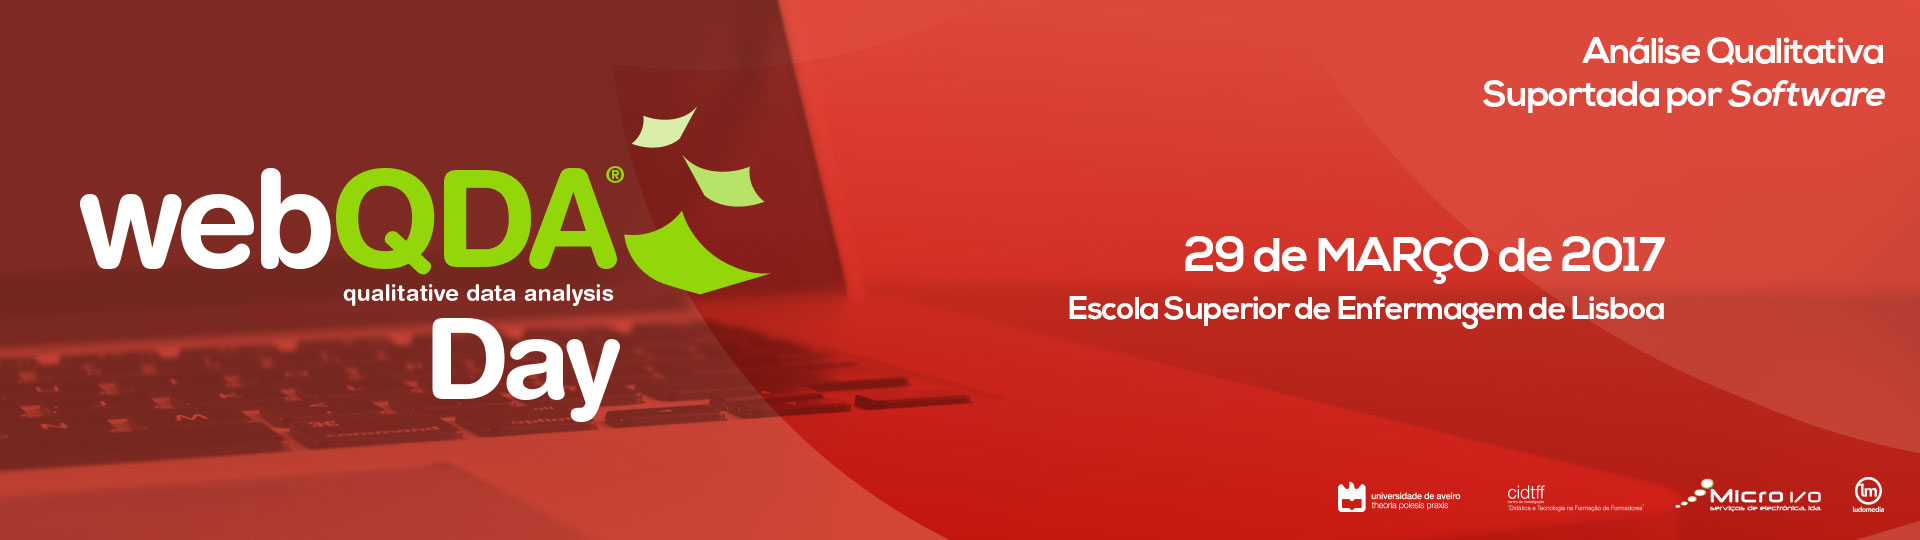 Banner webQDA Day ESEL